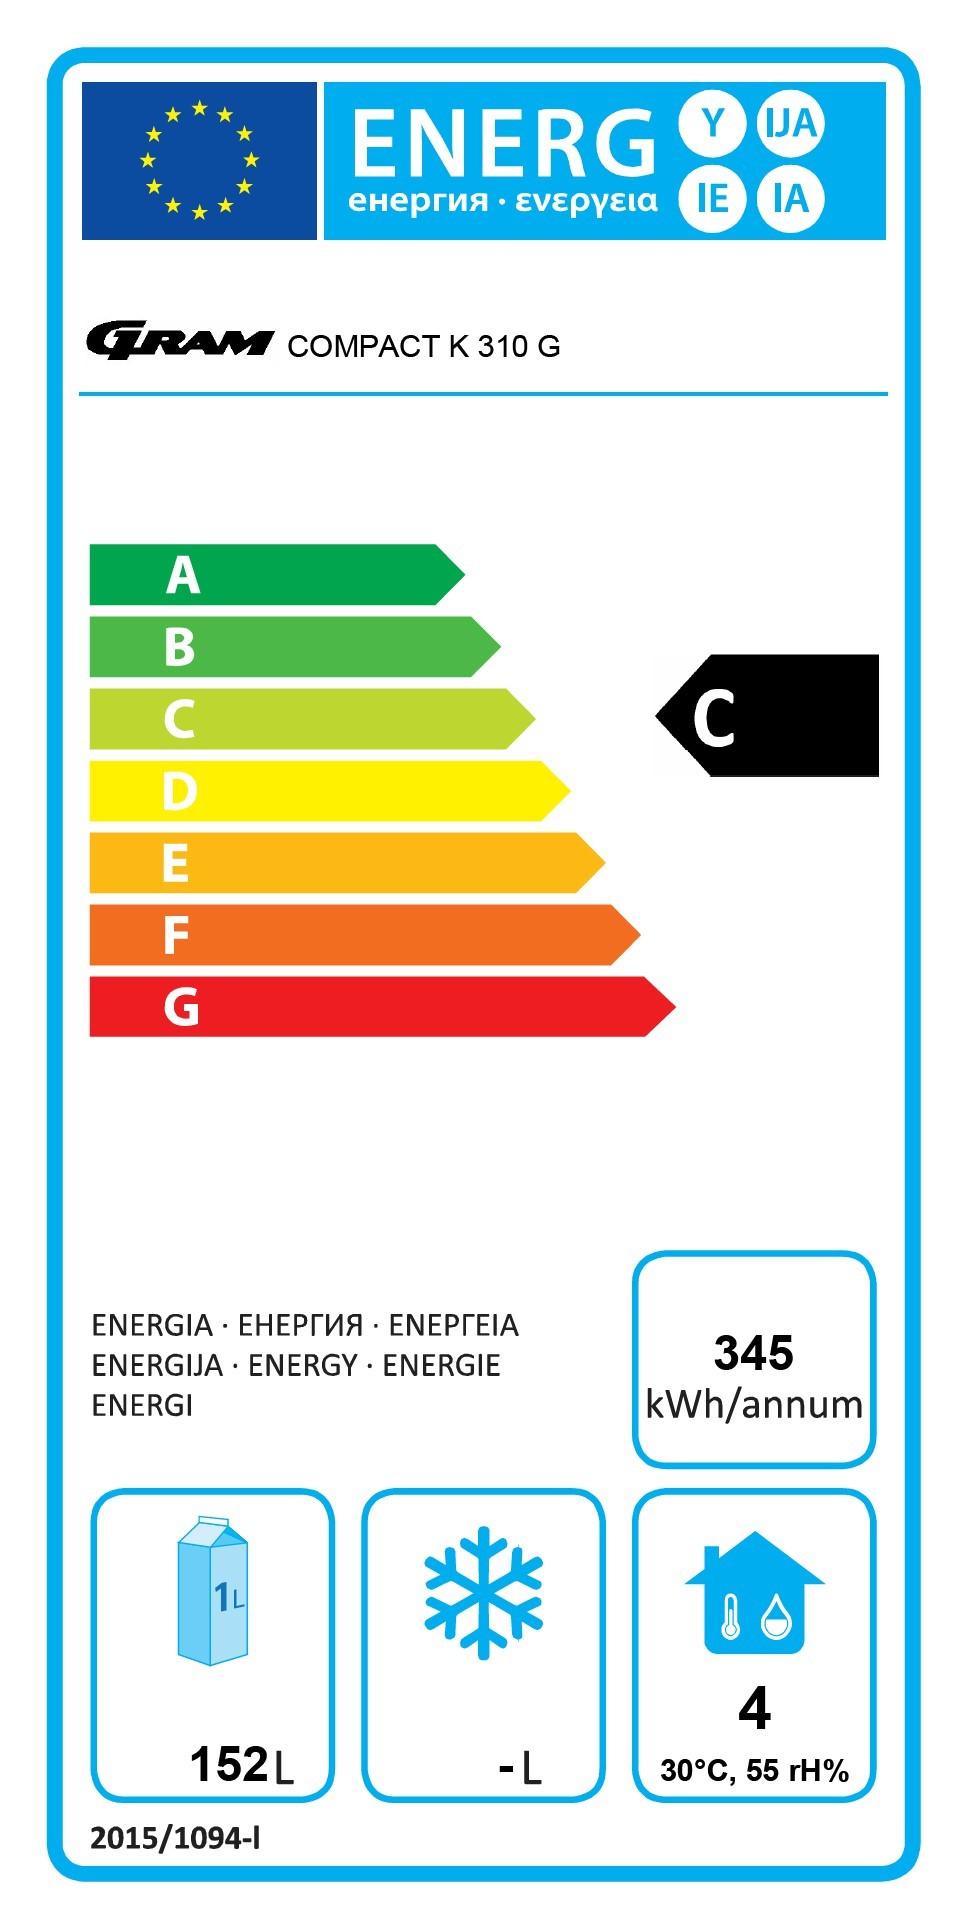 COMPACT K 310 LG C 4W 218 Ltr Upright Fridge Energy Rating